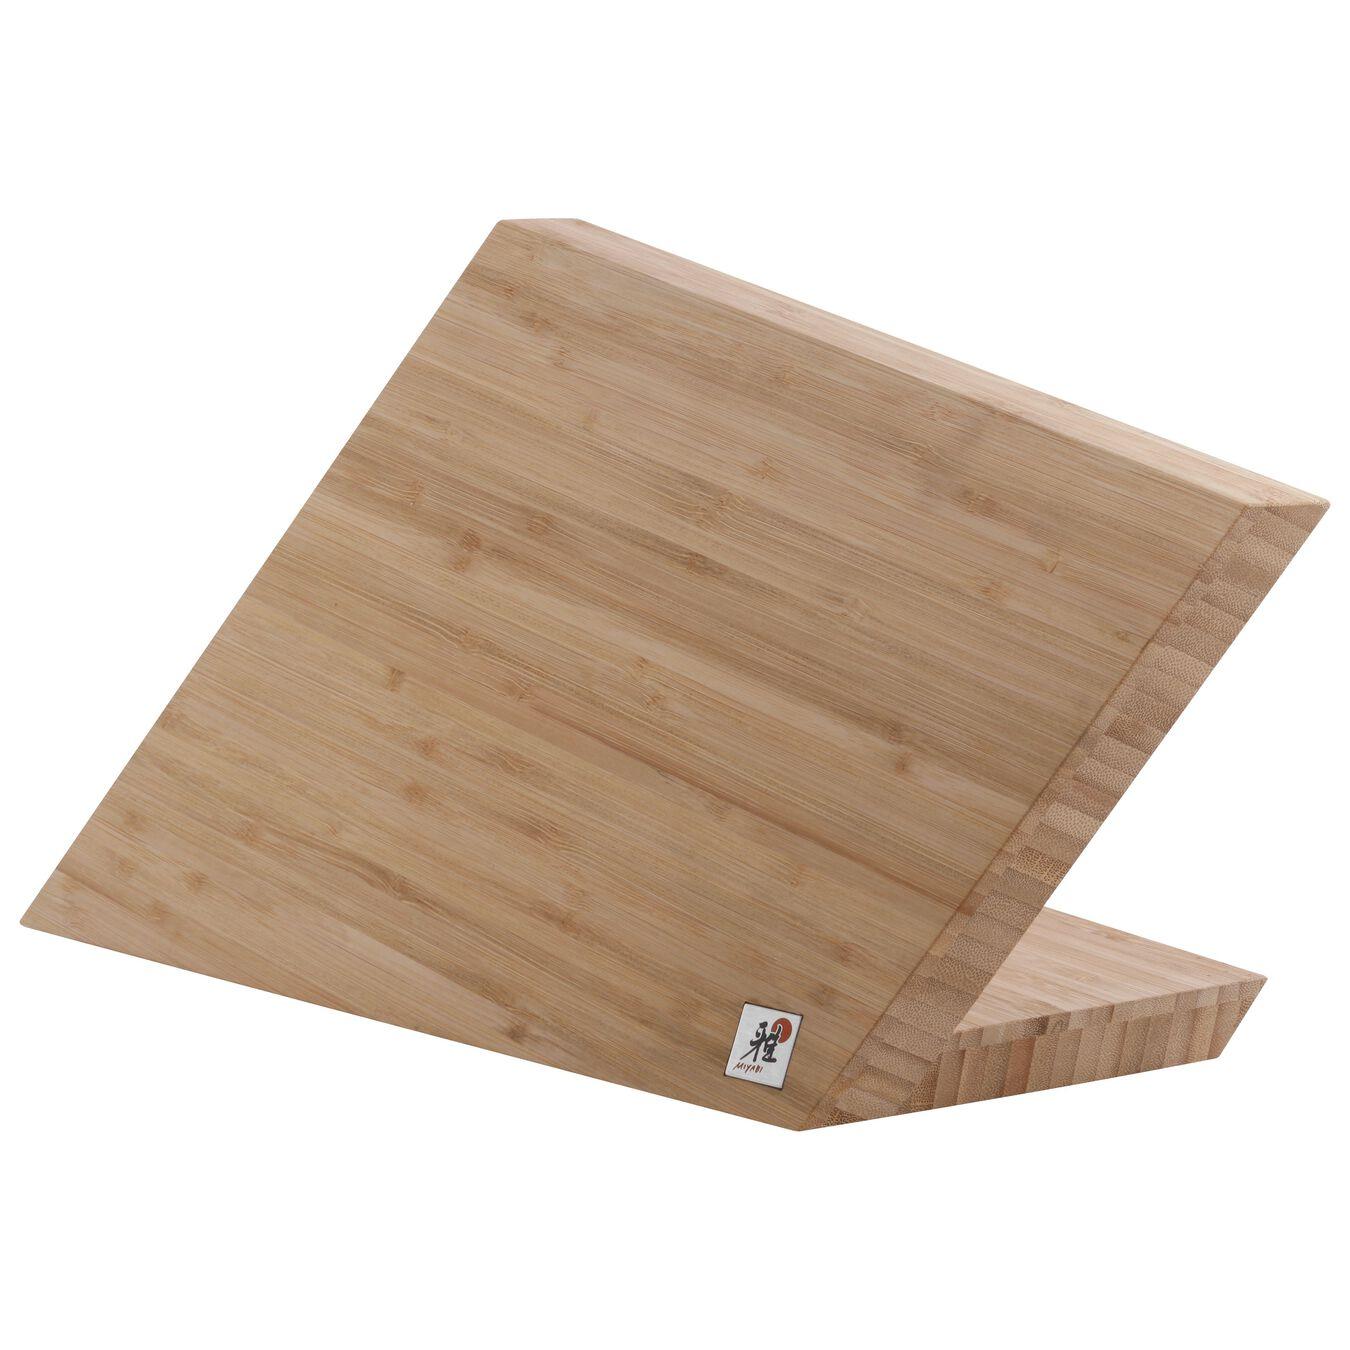 Messenblok, leeg, Bamboe,,large 1